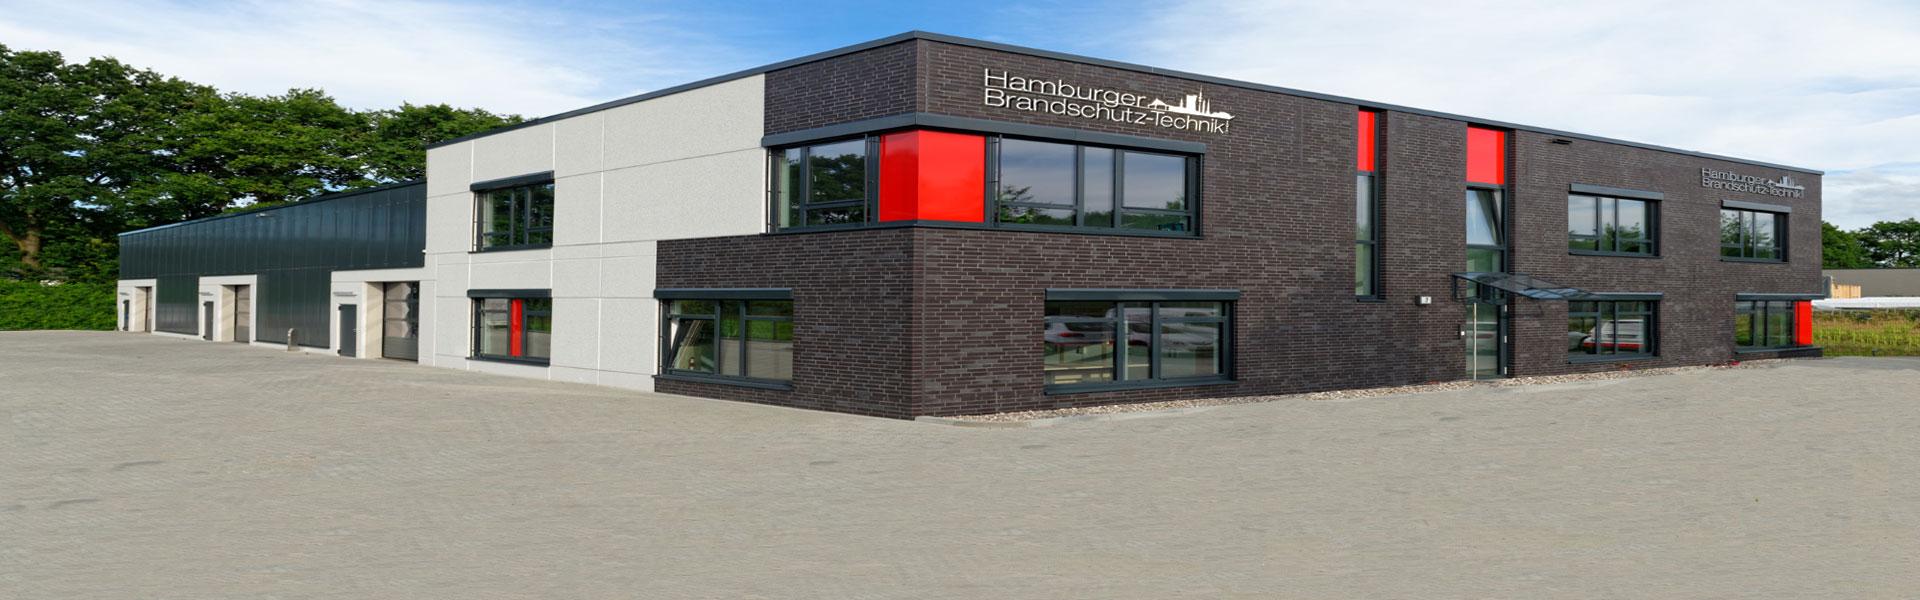 HBT HAMBURGER BRANDSCHUTZ TECHNIK GmbH